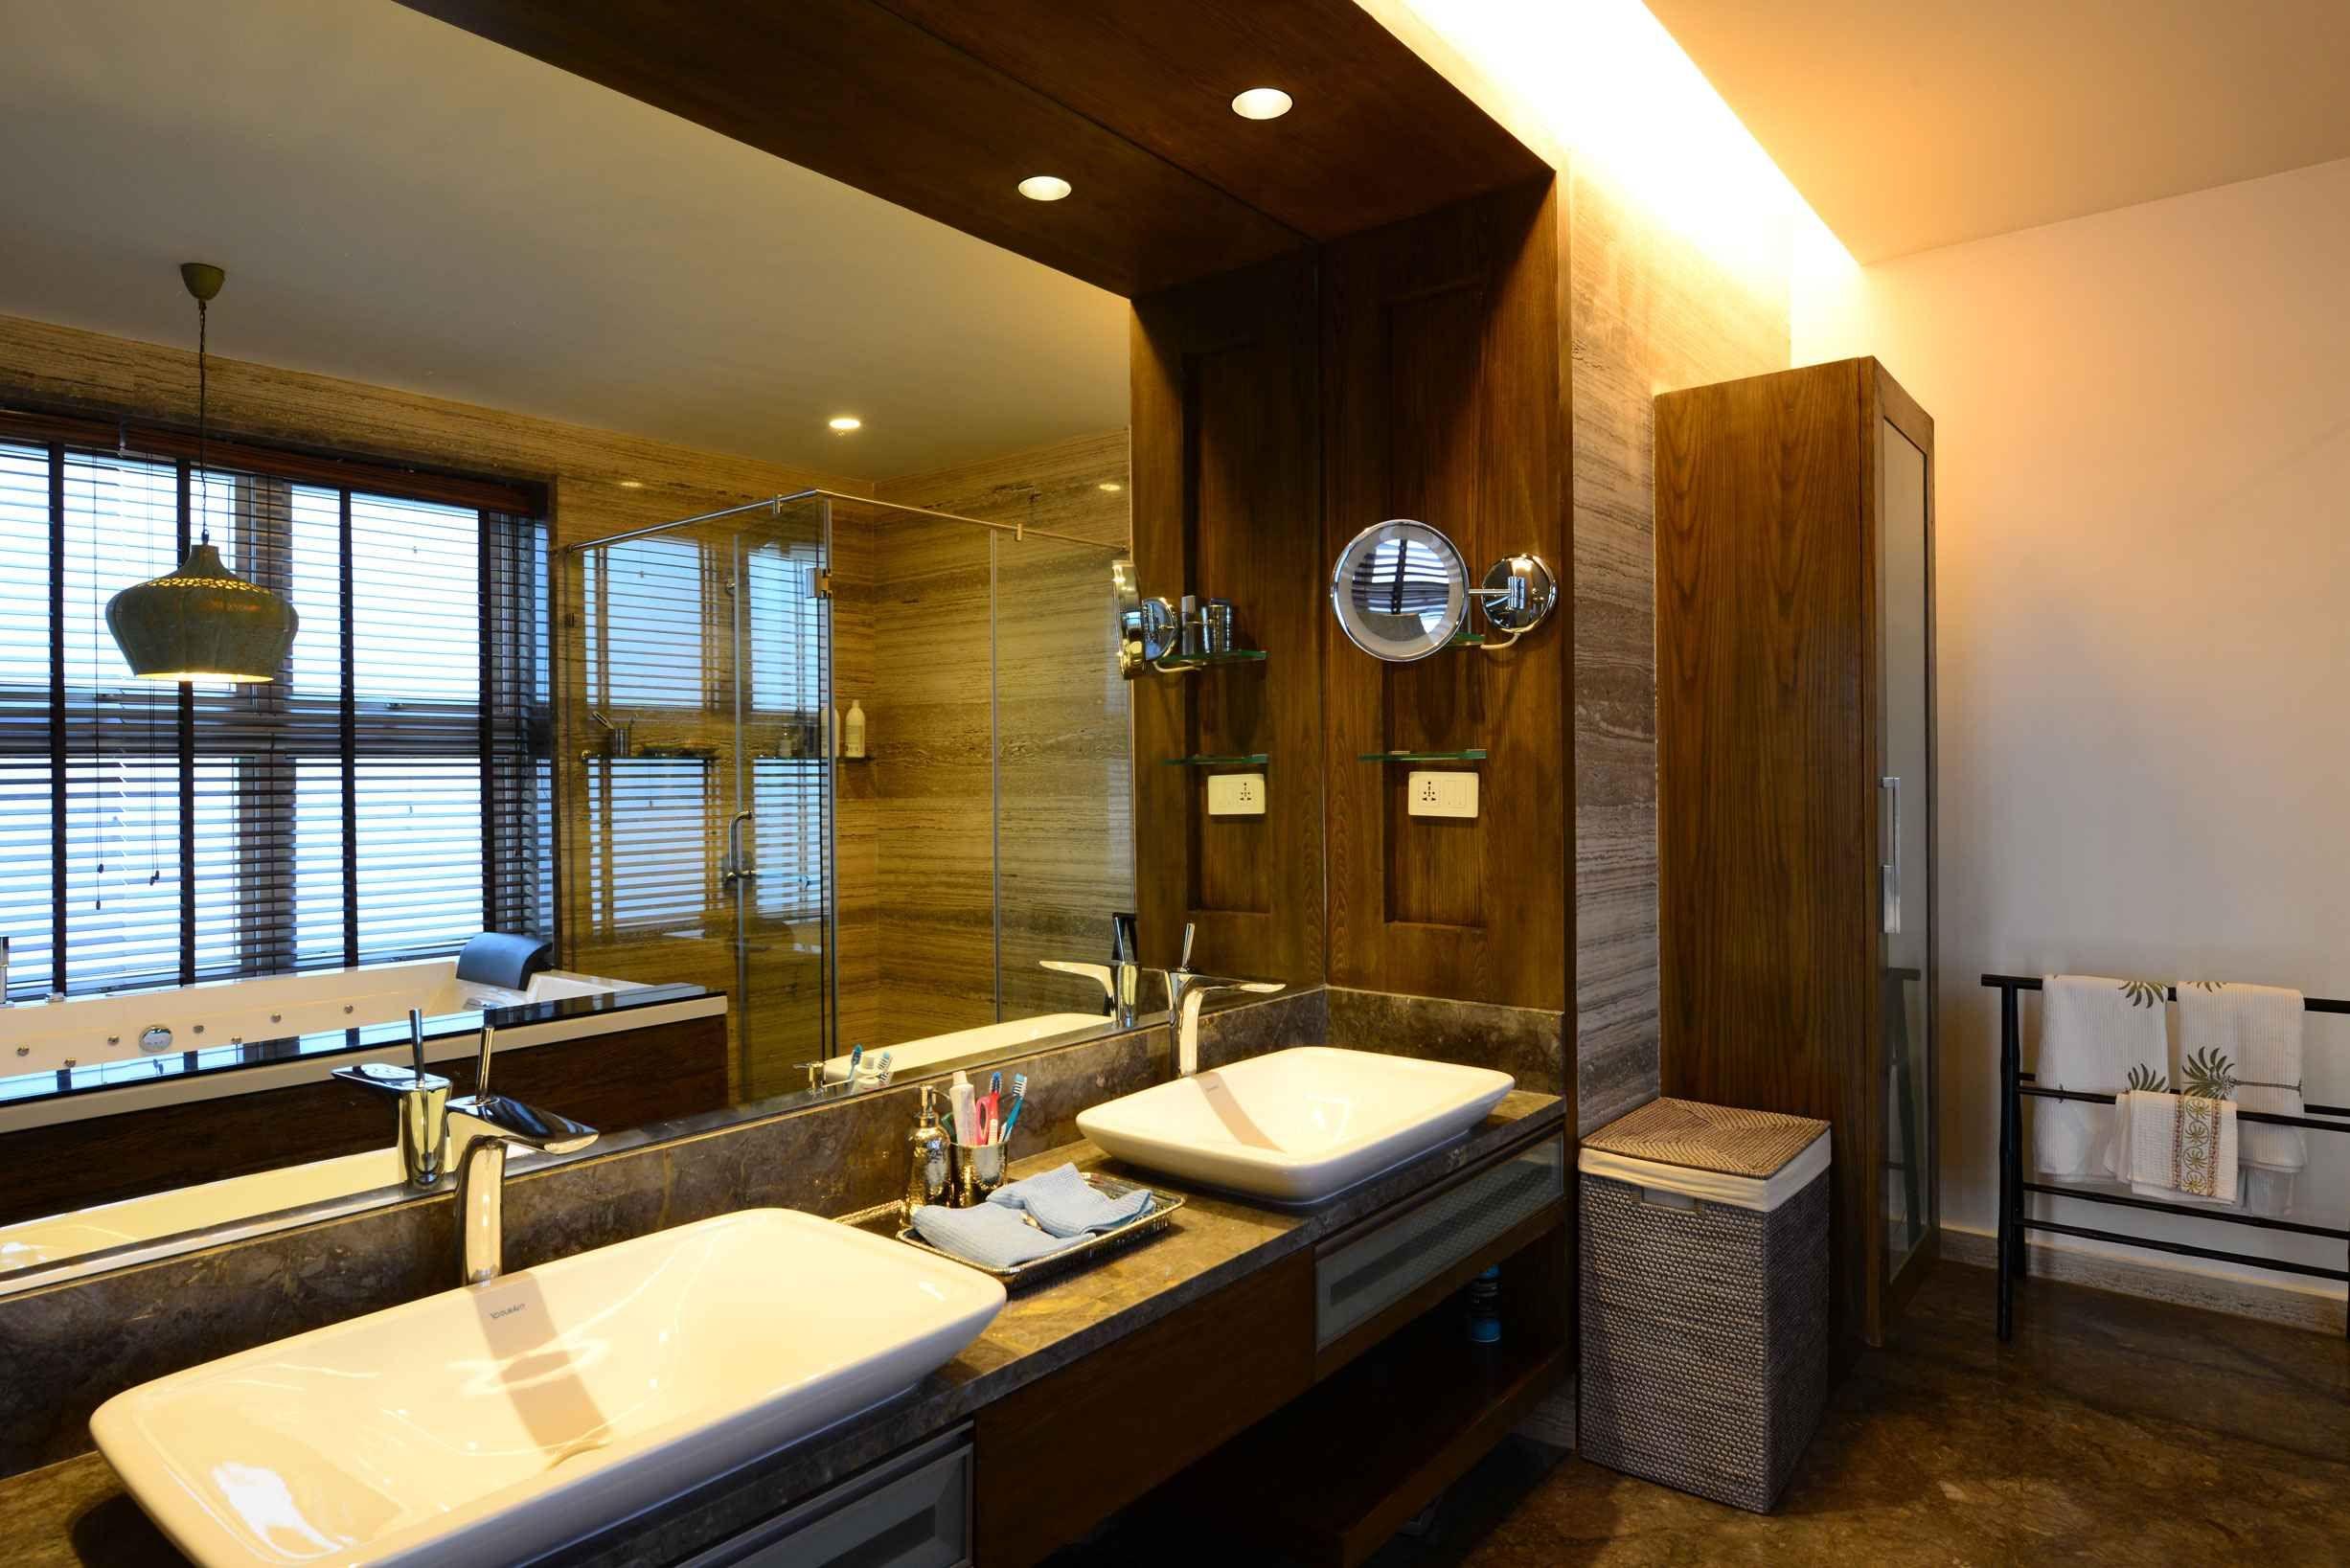 Modern Master Bathroom Designed by Hameeda Sharma, Architect in